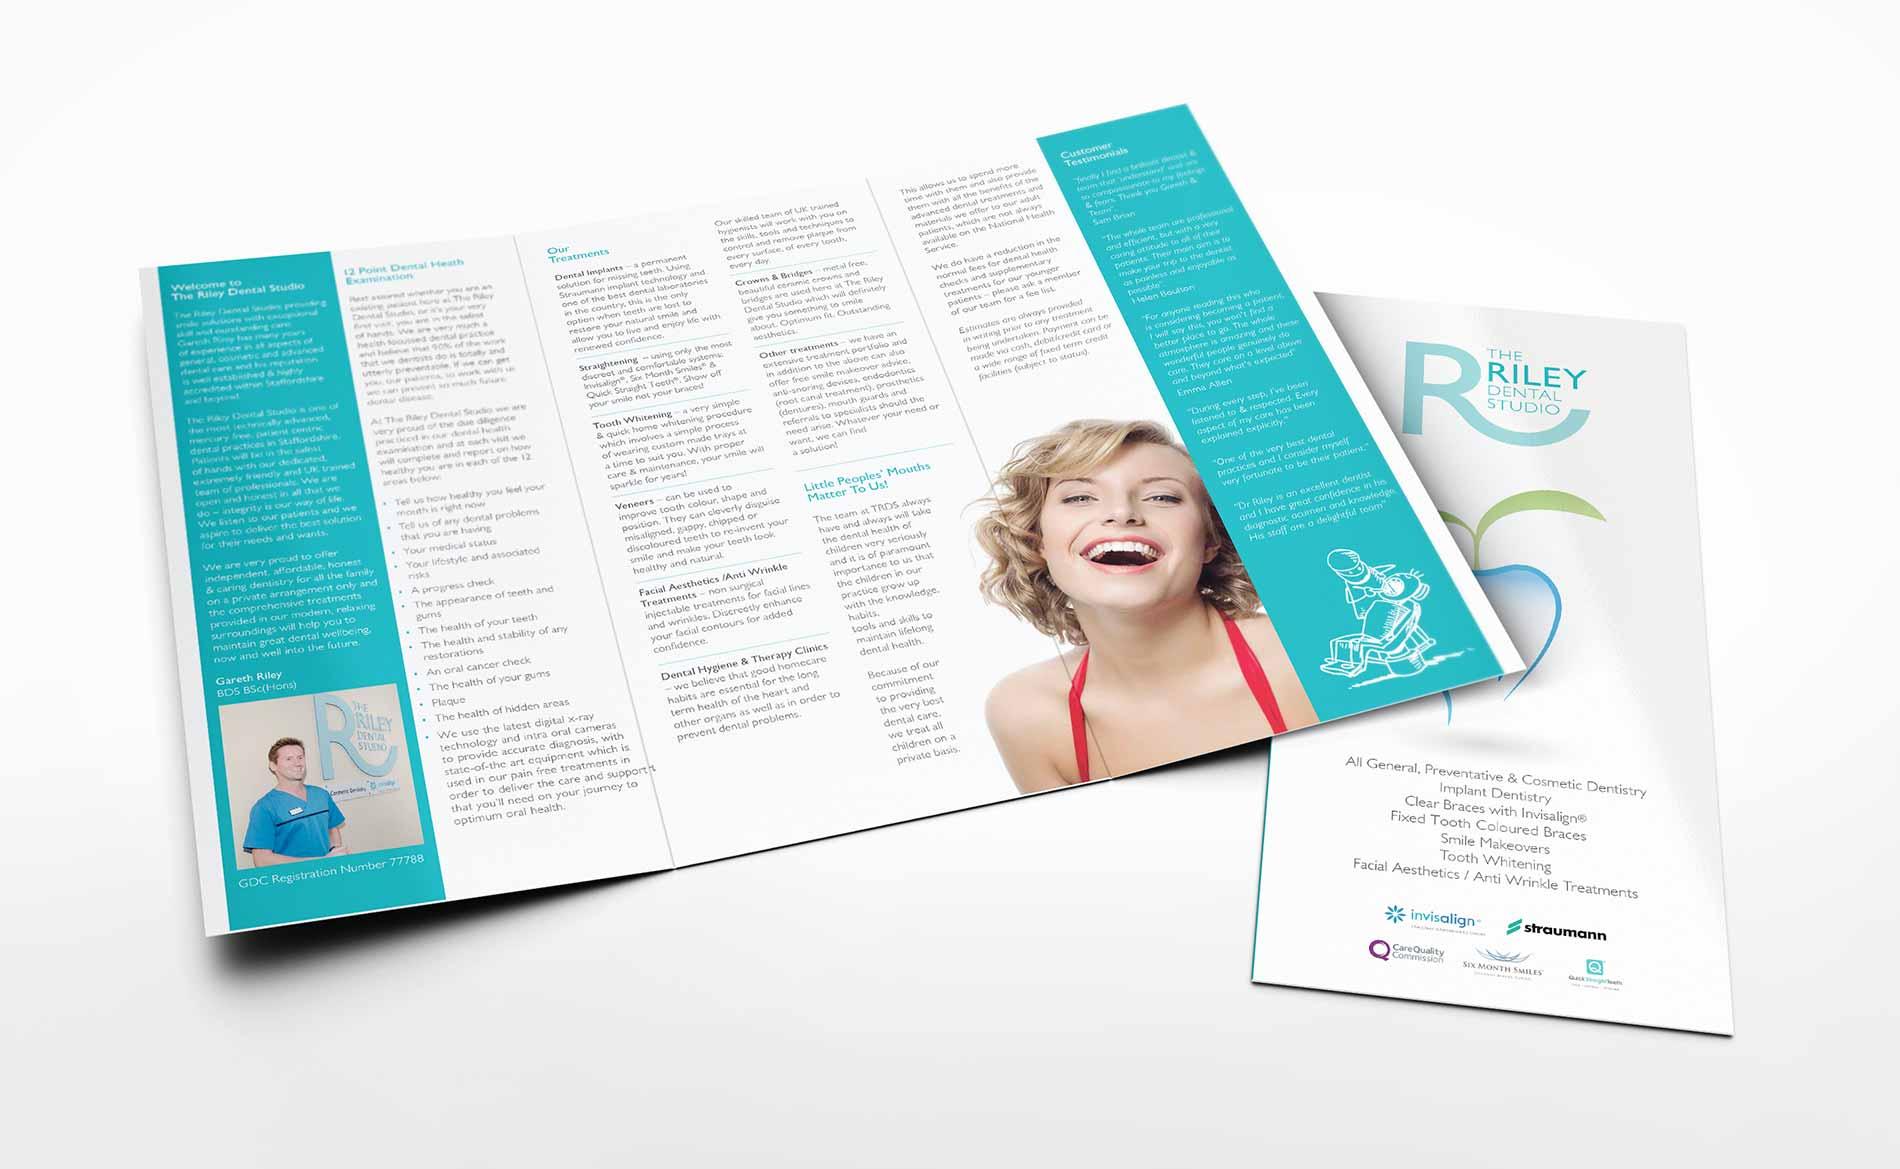 Digital Print, Riley Dental, Folded Leaflets, Stoke-on-Trent, Staffordshire